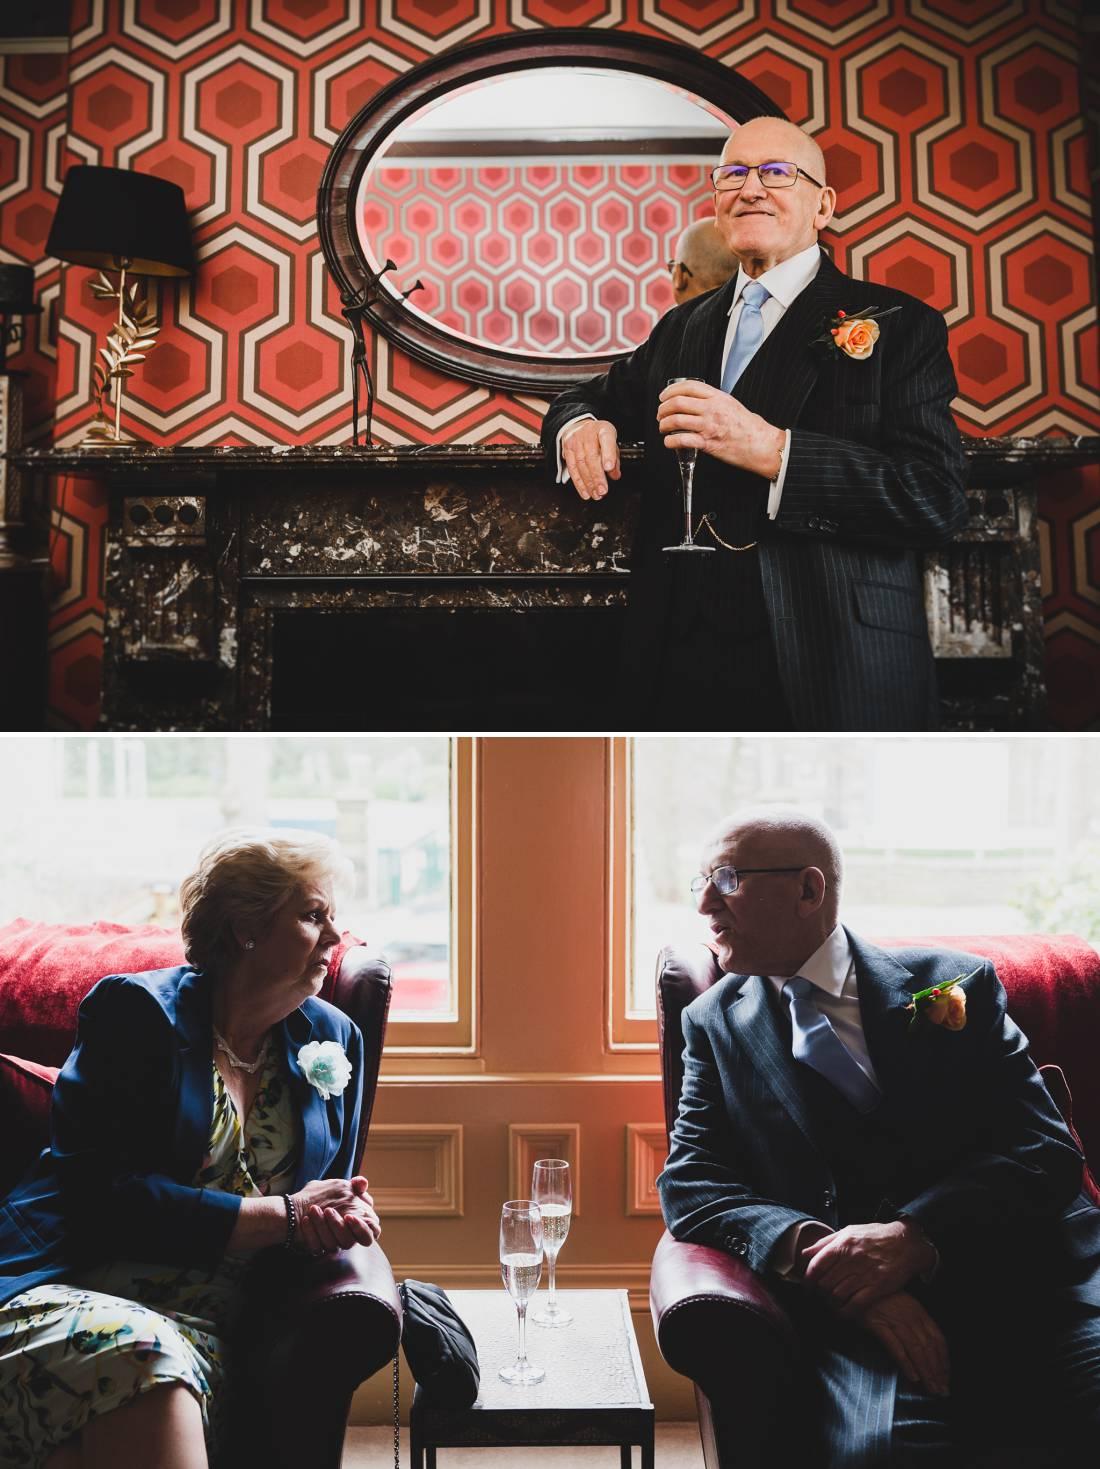 Halifax Registry office Wedding - Jane and Larteque 3